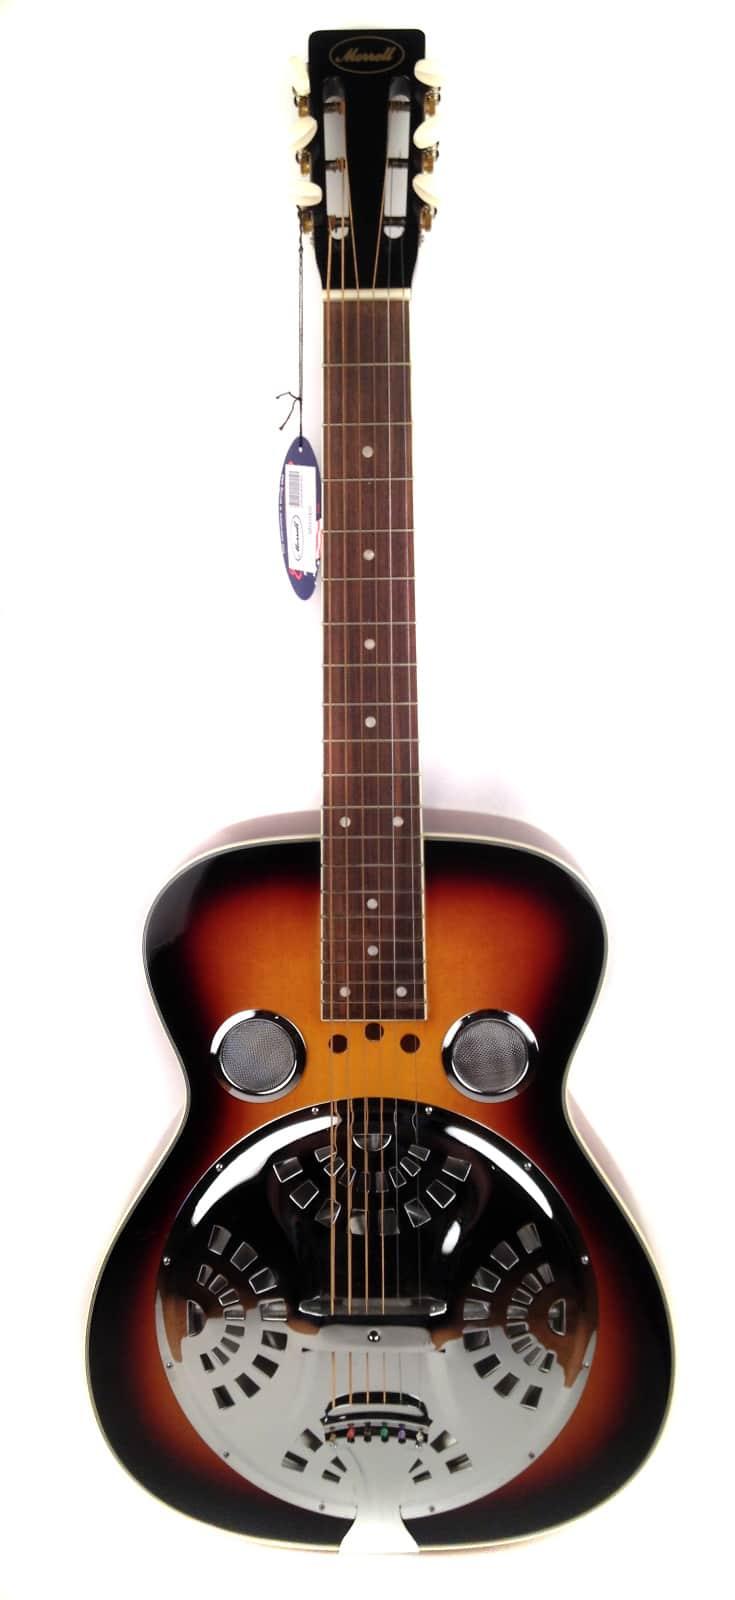 morrell md100s square neck resonator dobro guitar reverb. Black Bedroom Furniture Sets. Home Design Ideas